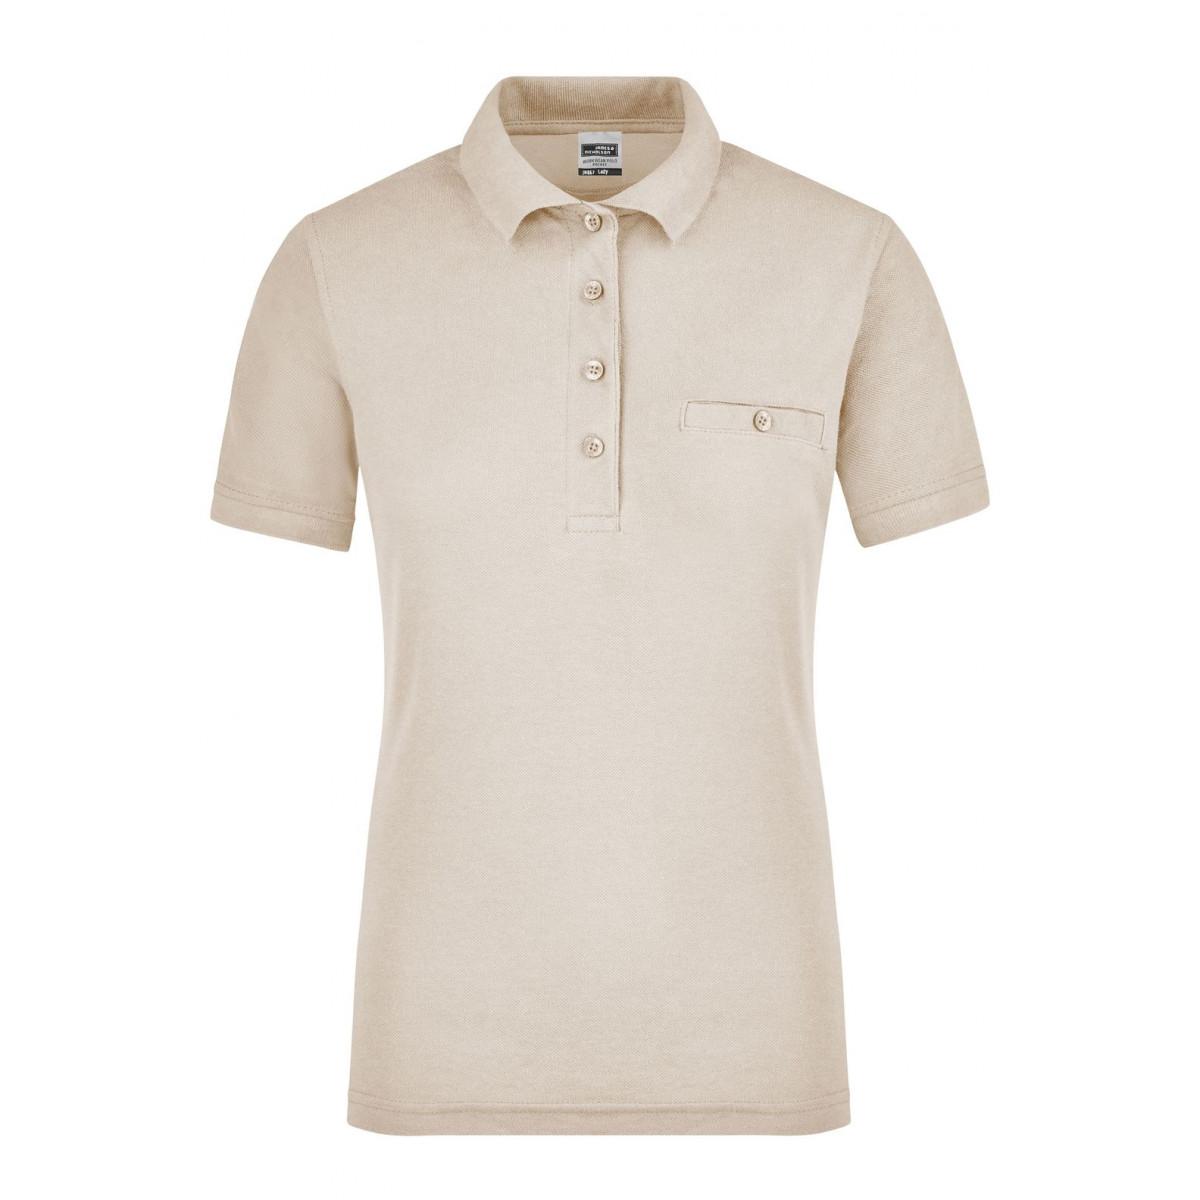 Рубашка поло женская JN867 Ladies Workwear Polo Pocket - Бежевый